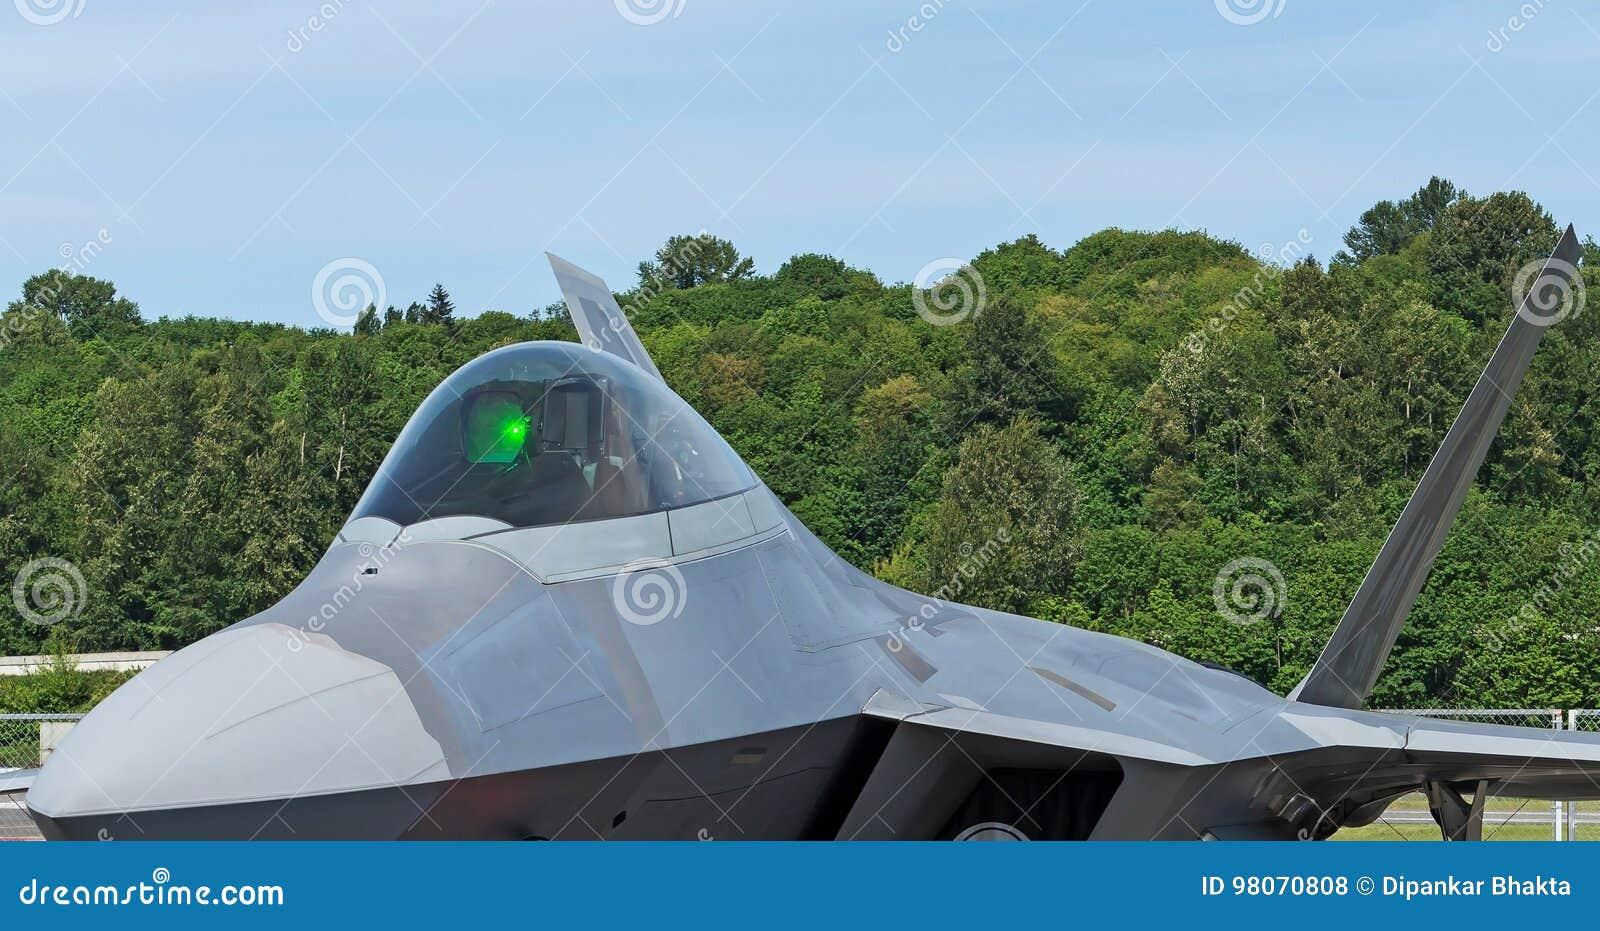 F22 Raptor Headon With Cockpit Closeup Standing In Lush Green Background Stock Photo Image Of Landingetihad Latest 98070808